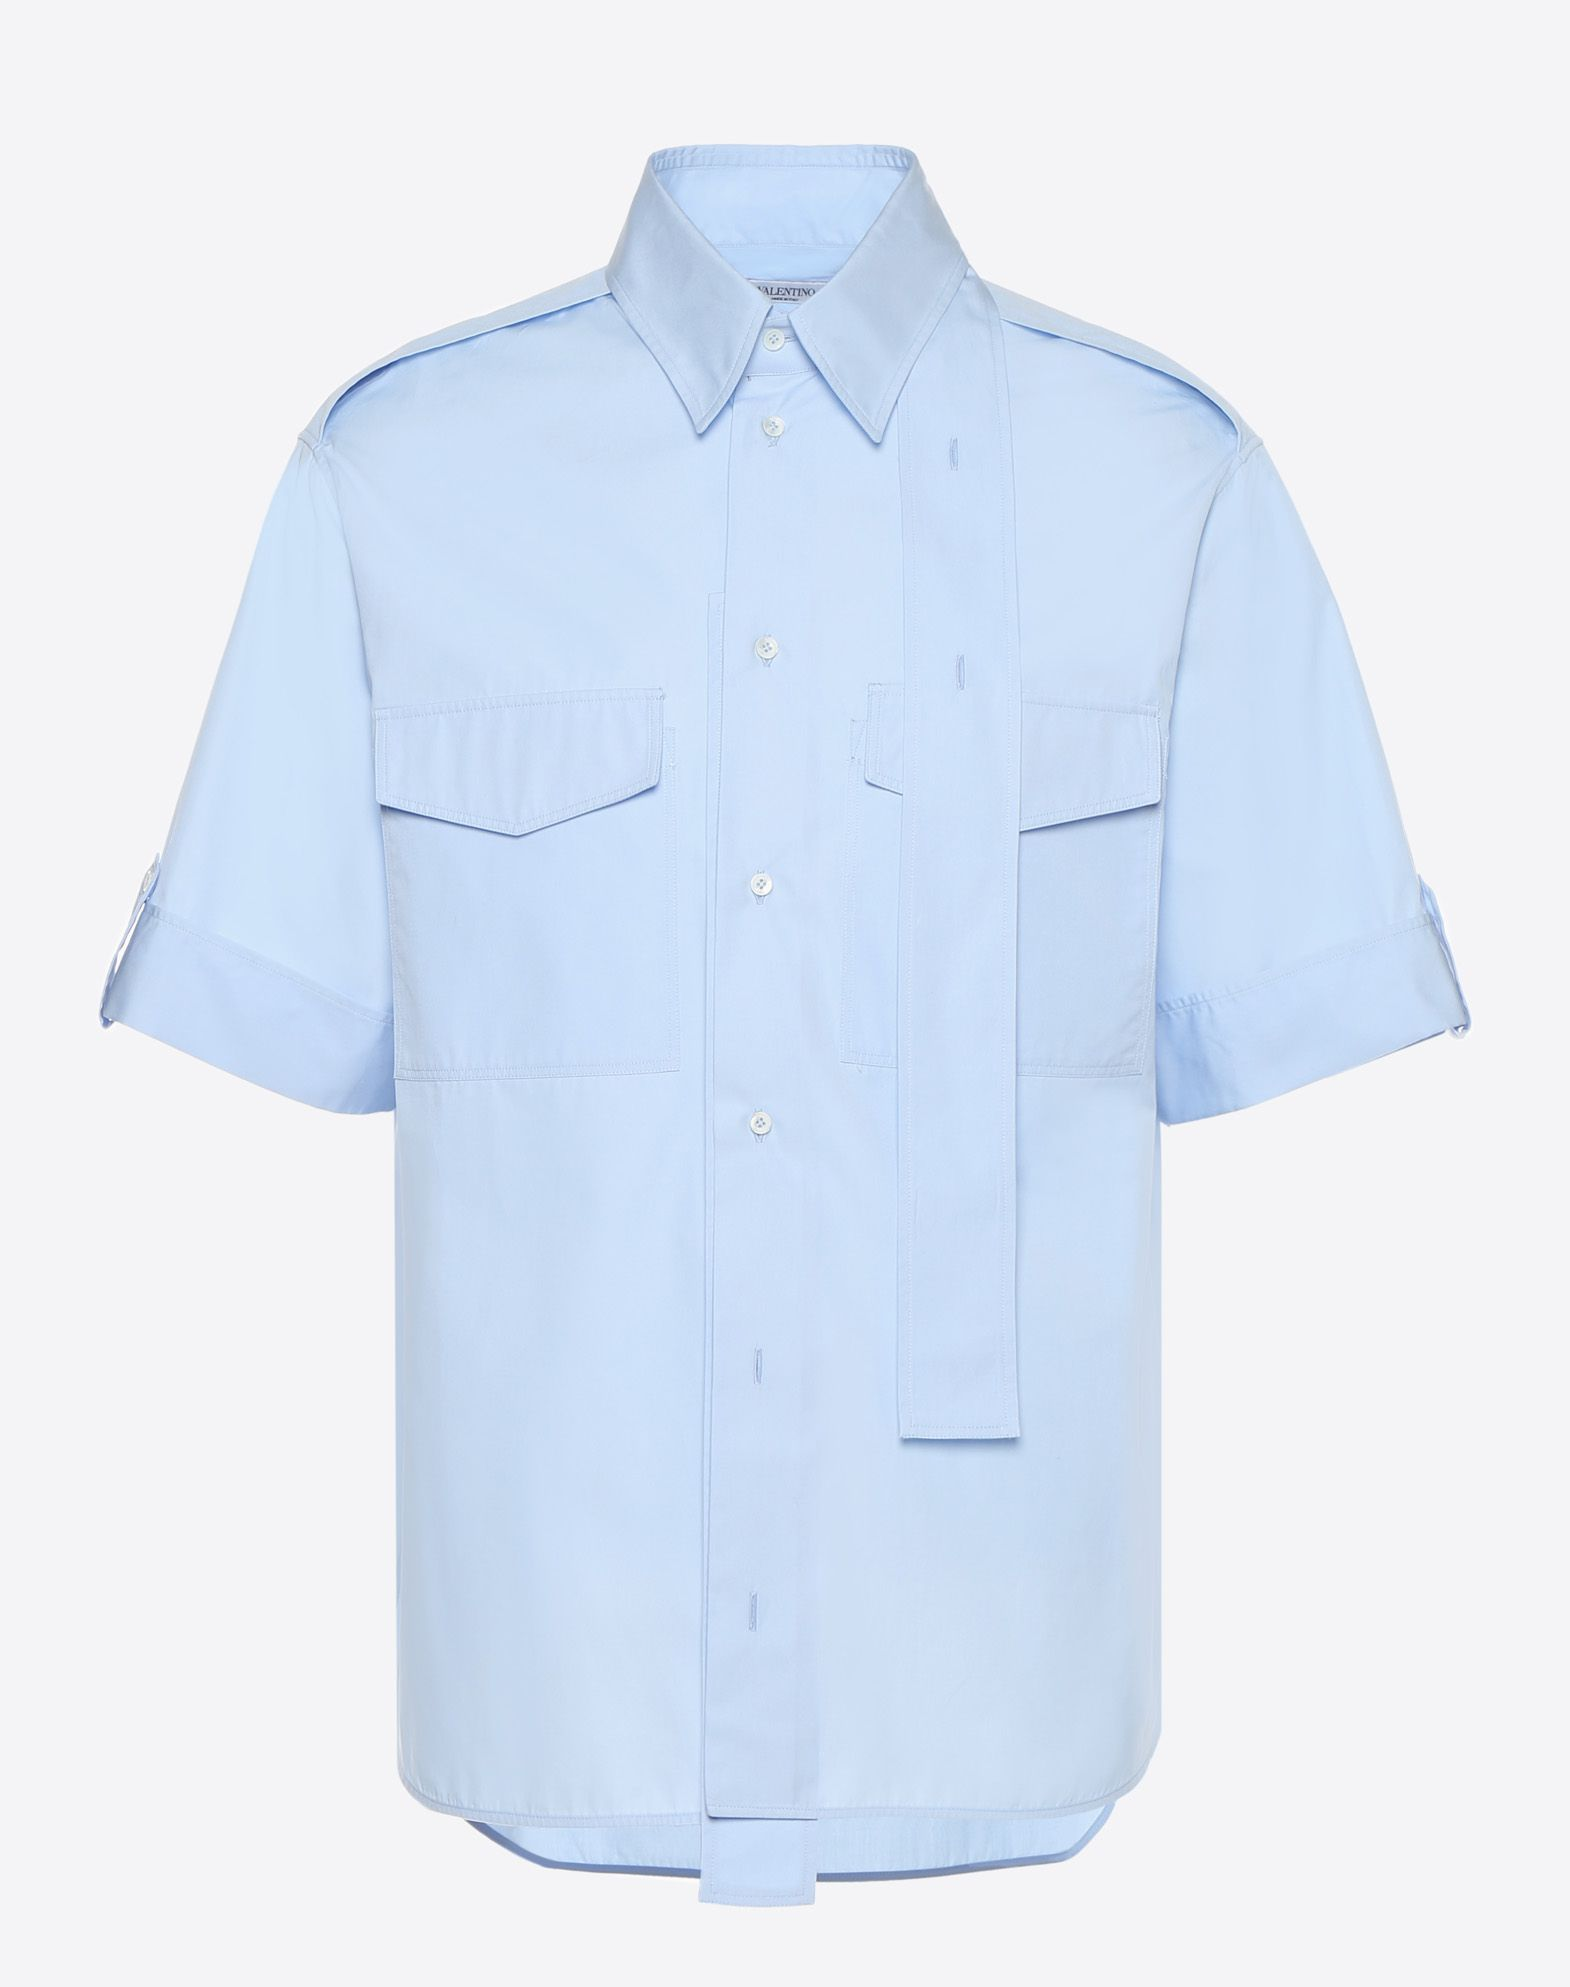 VALENTINO Plain weave Basic solid colour Classic Neckline Two pockets  12142949uu